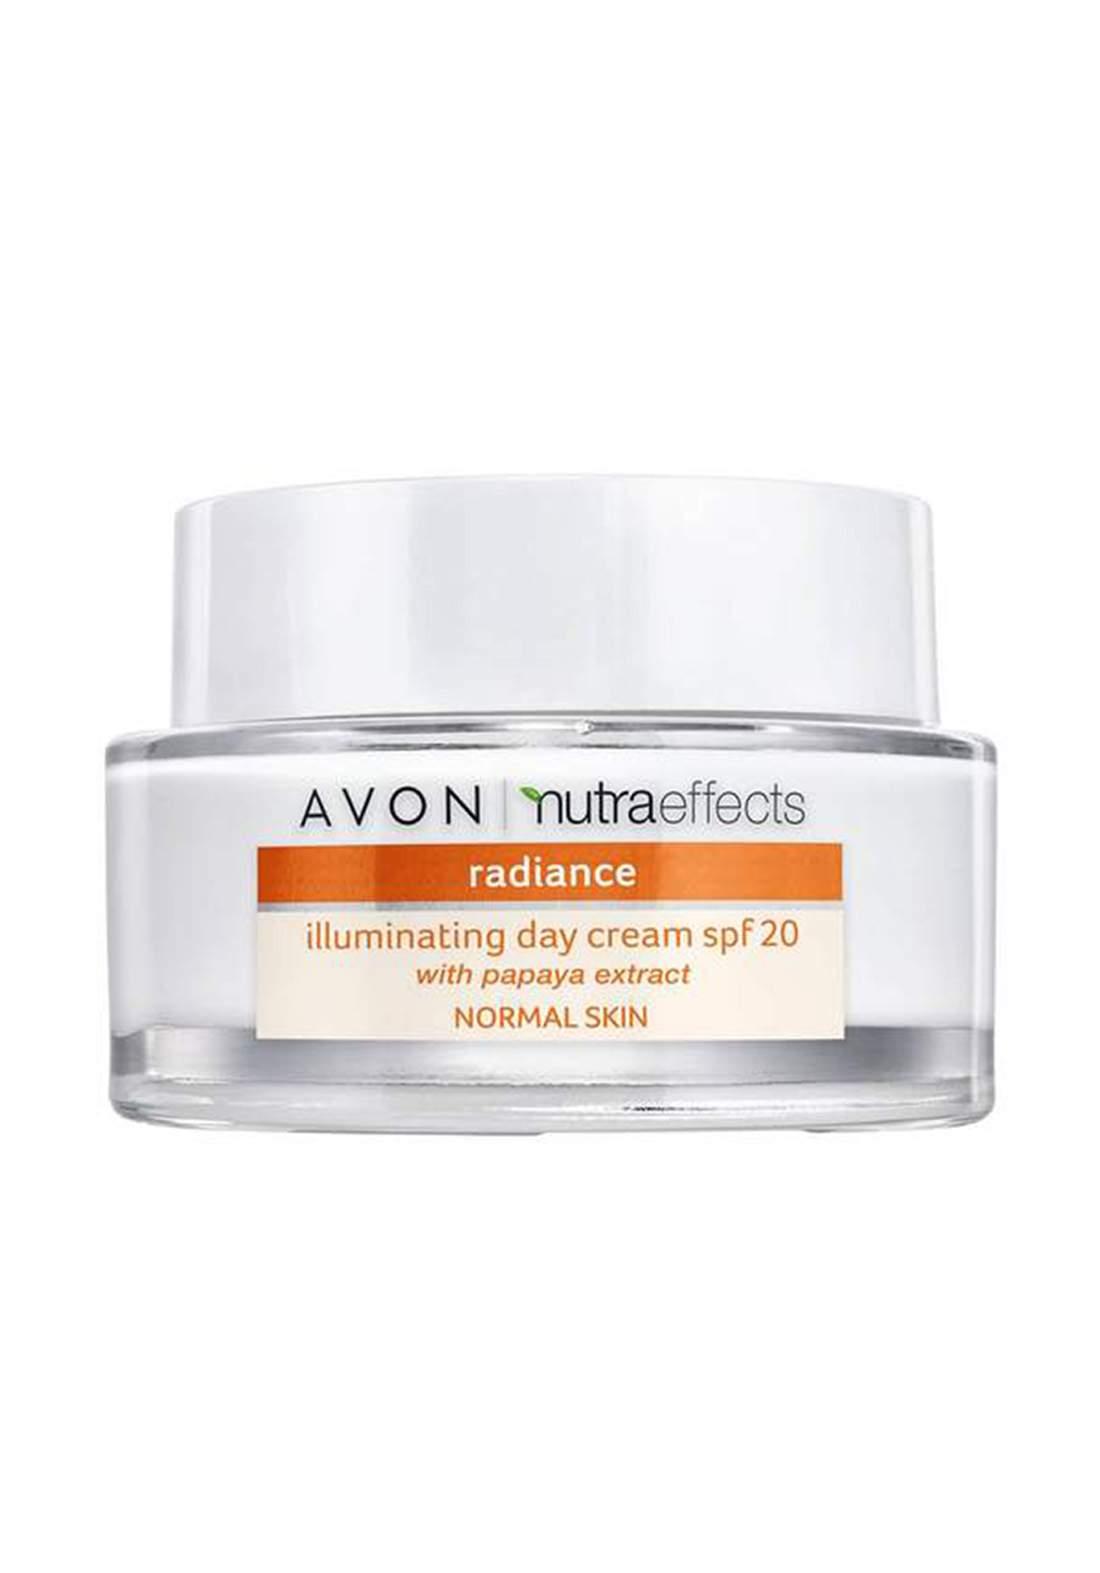 Avon 1343437 Nutra Effects Radiance Illuminating Day Cream SPF20 50 Ml كريم نهاري